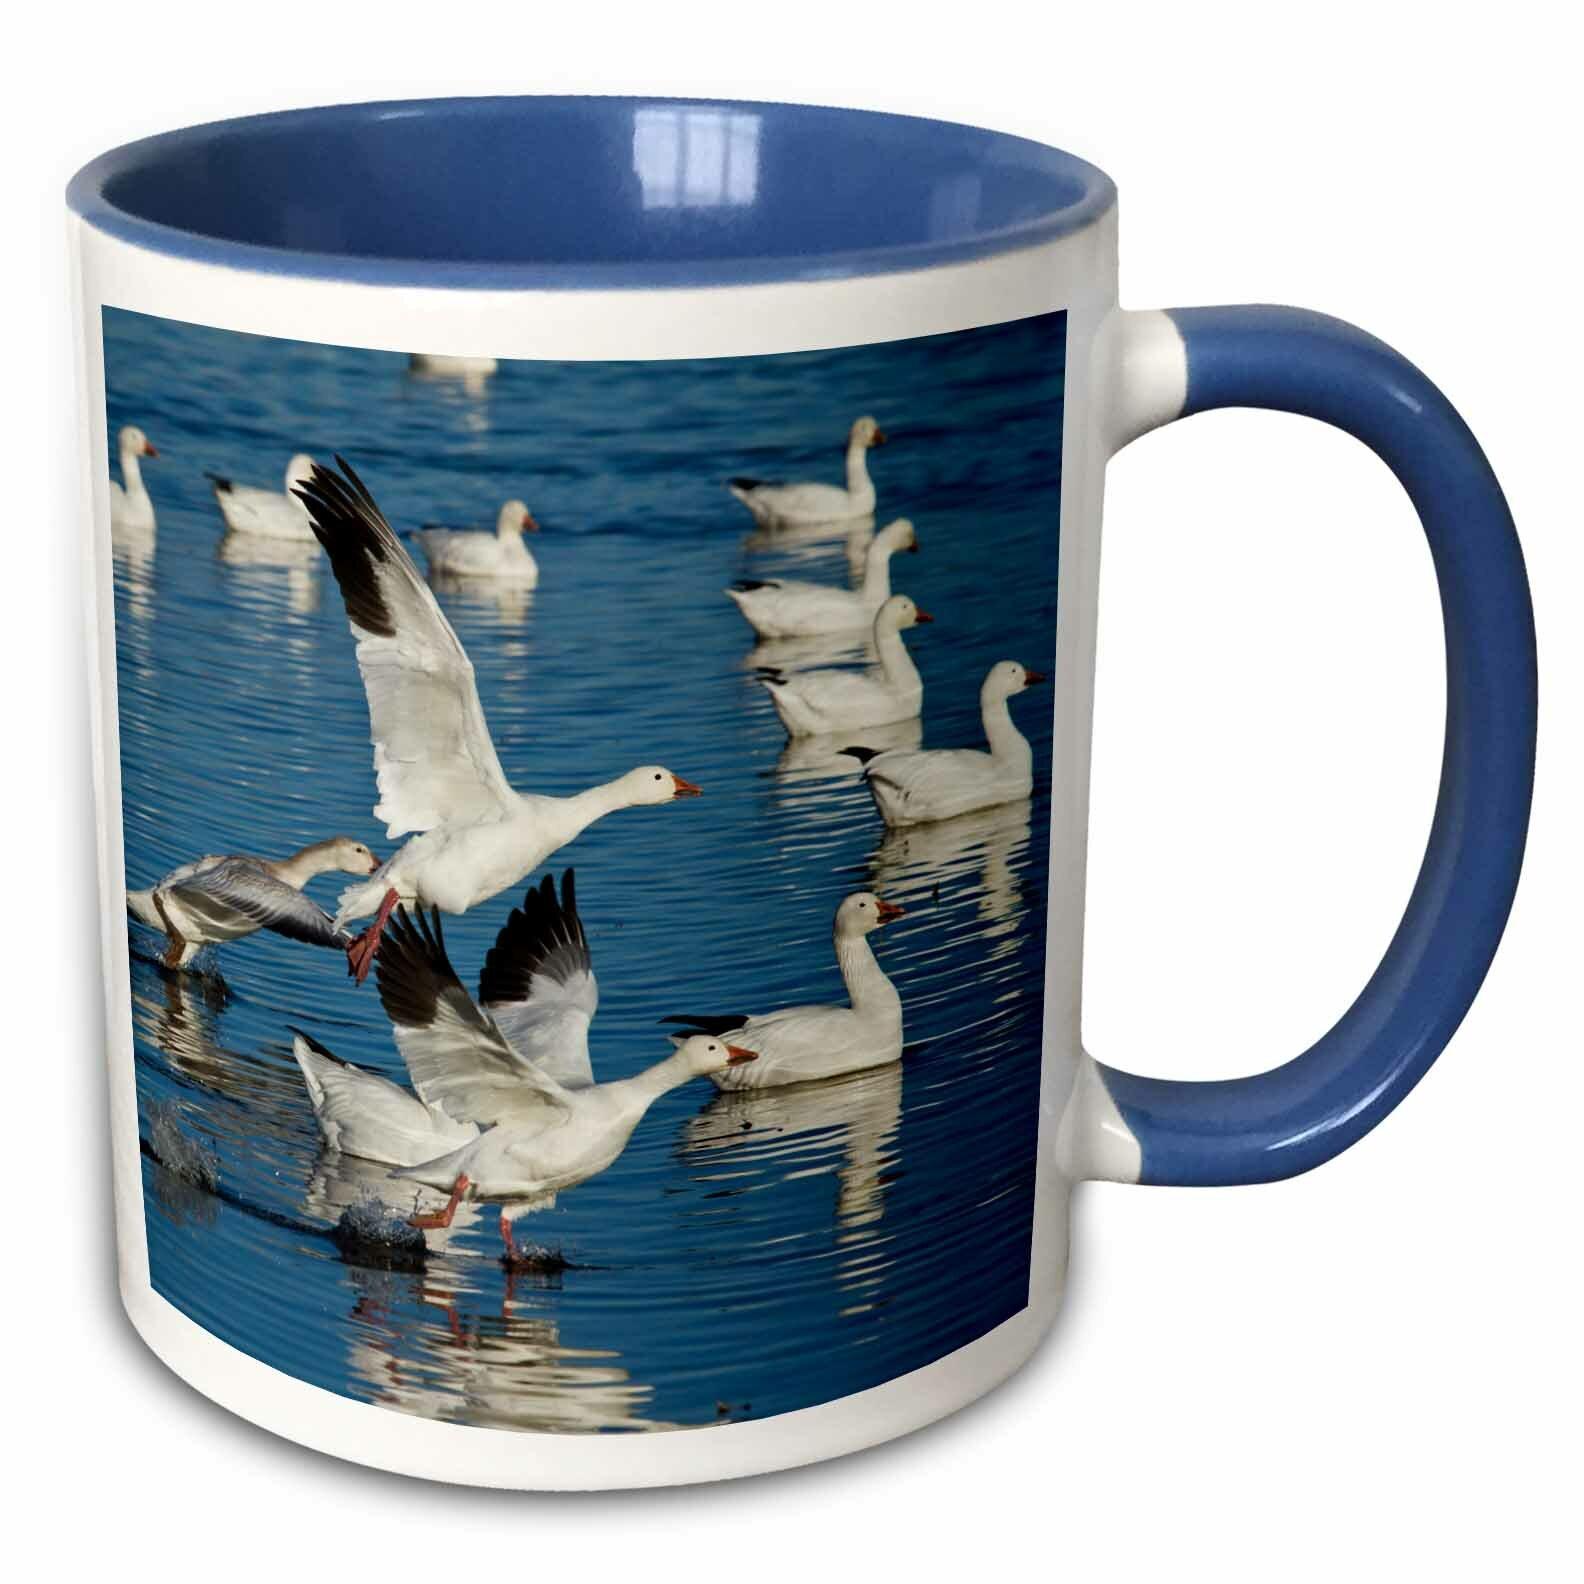 Ceramic blue mug with geese